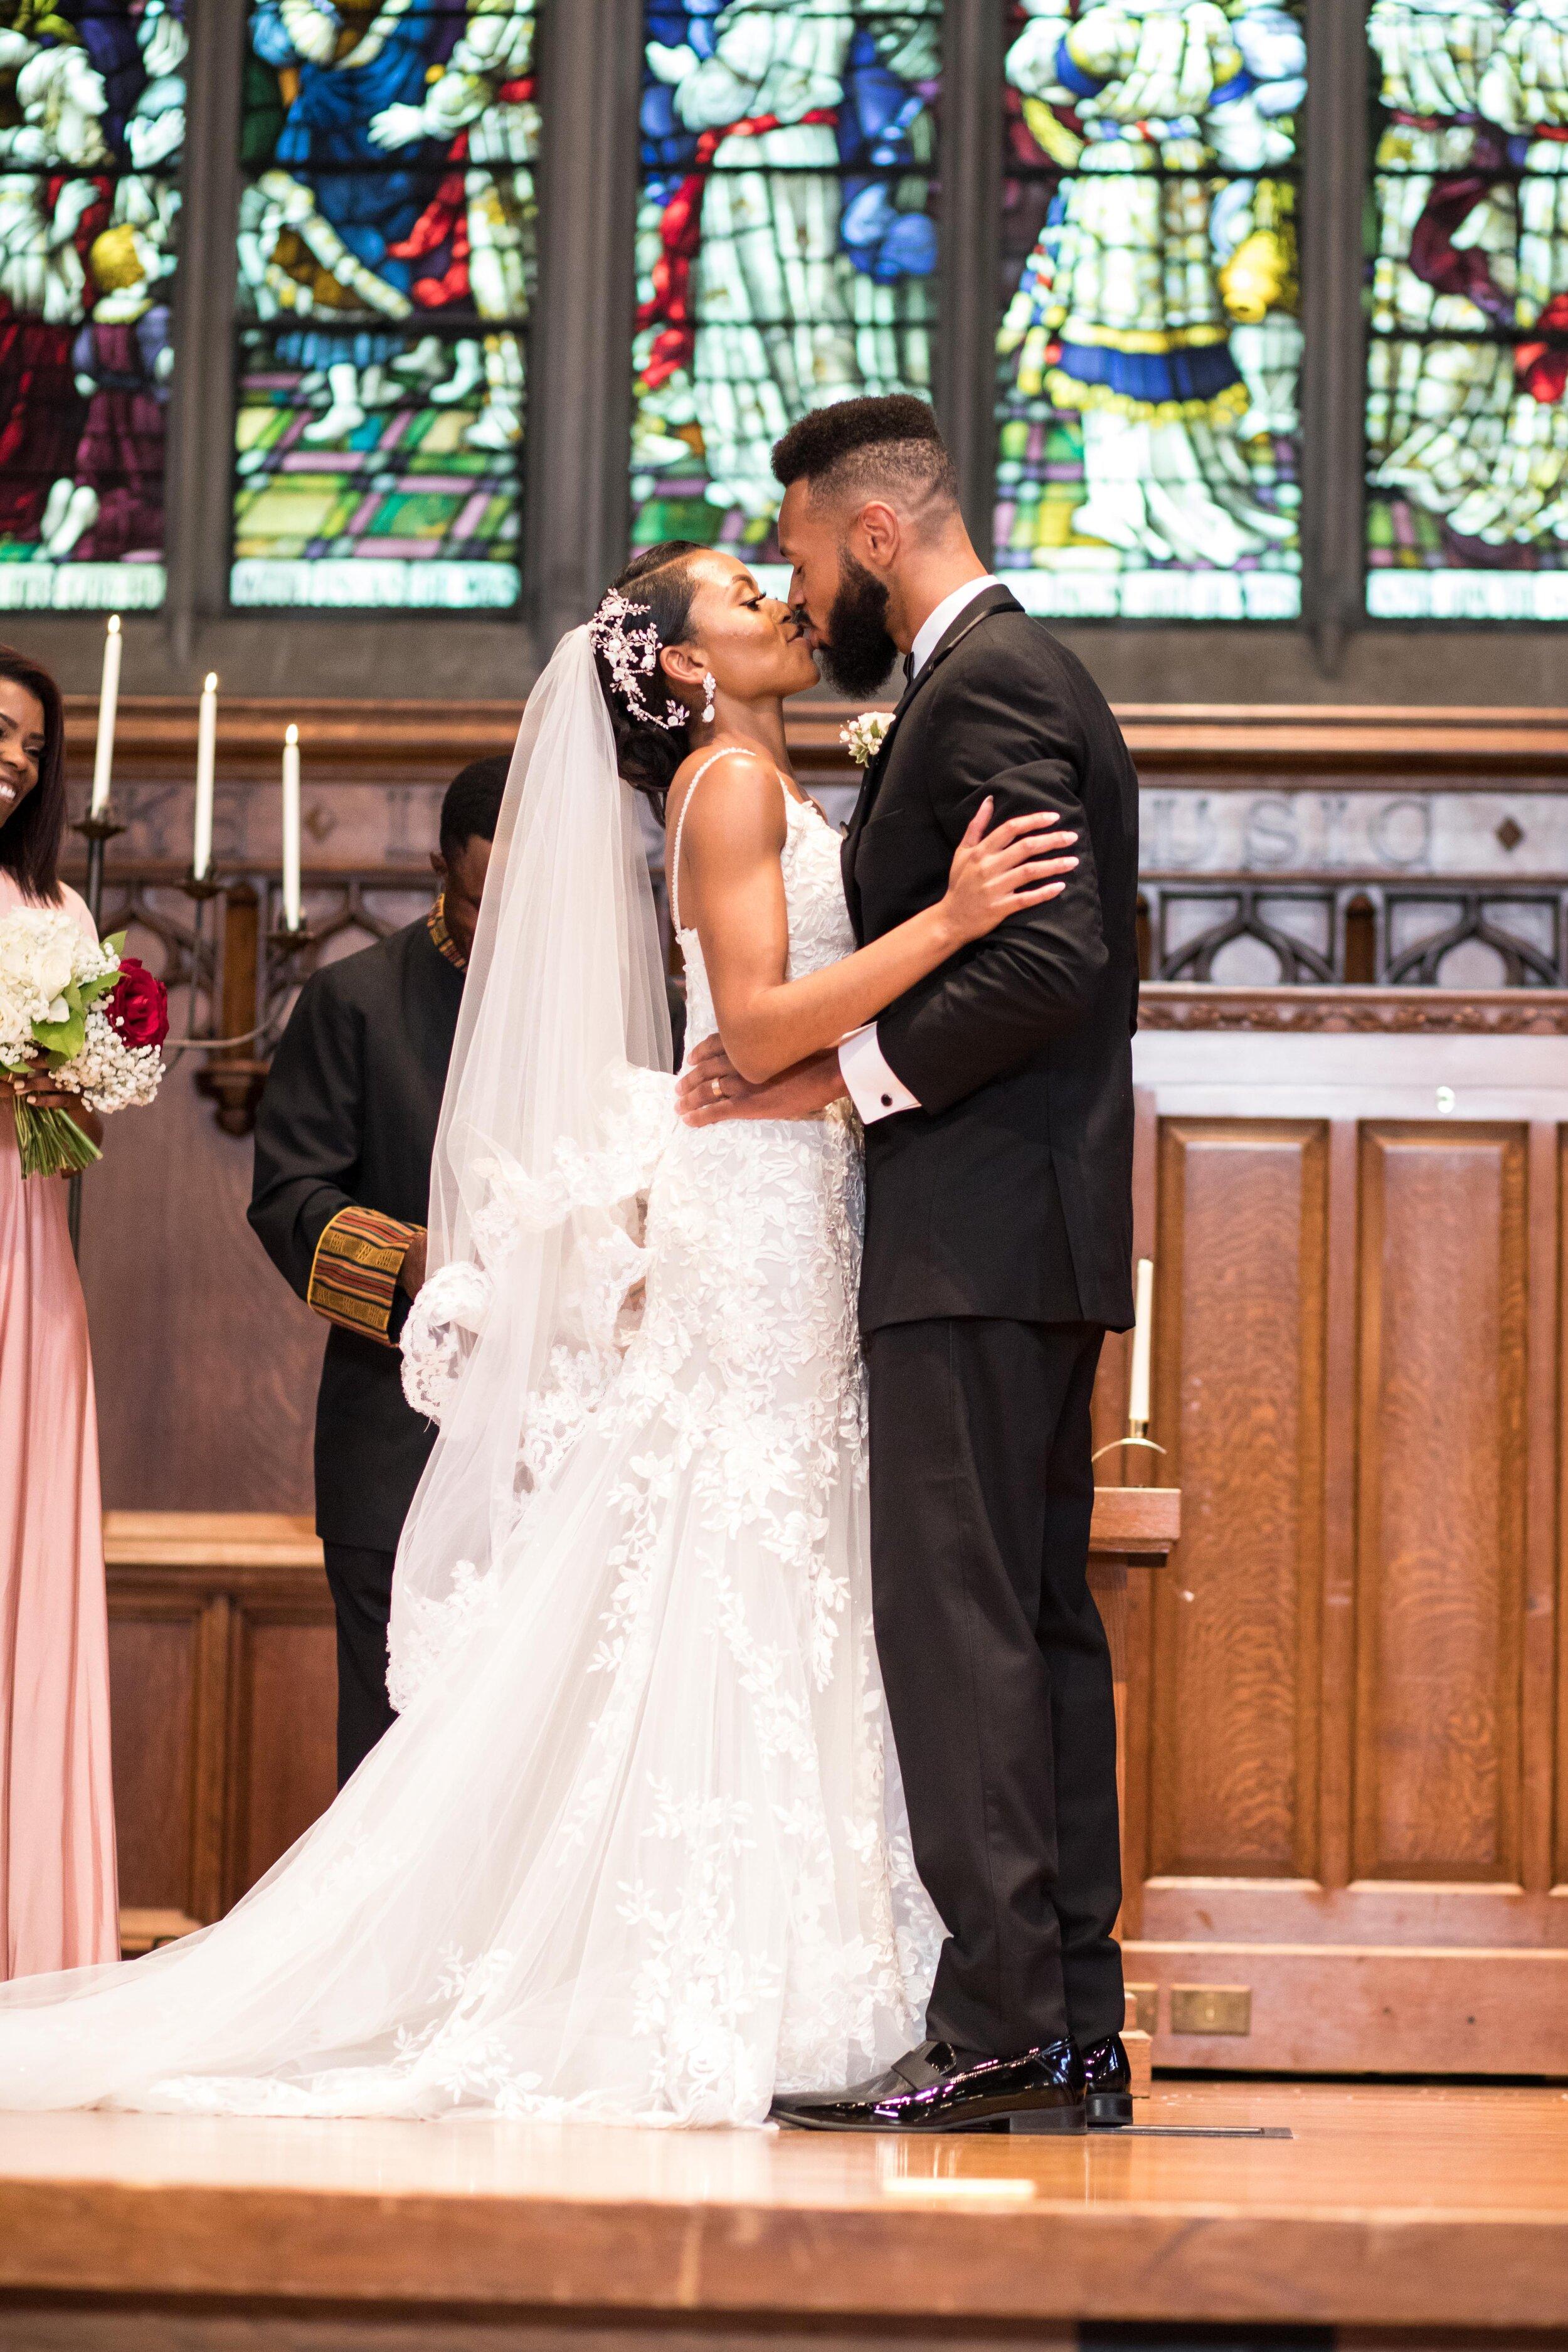 8_3_2019_BONTY_WEDDING-383.jpg